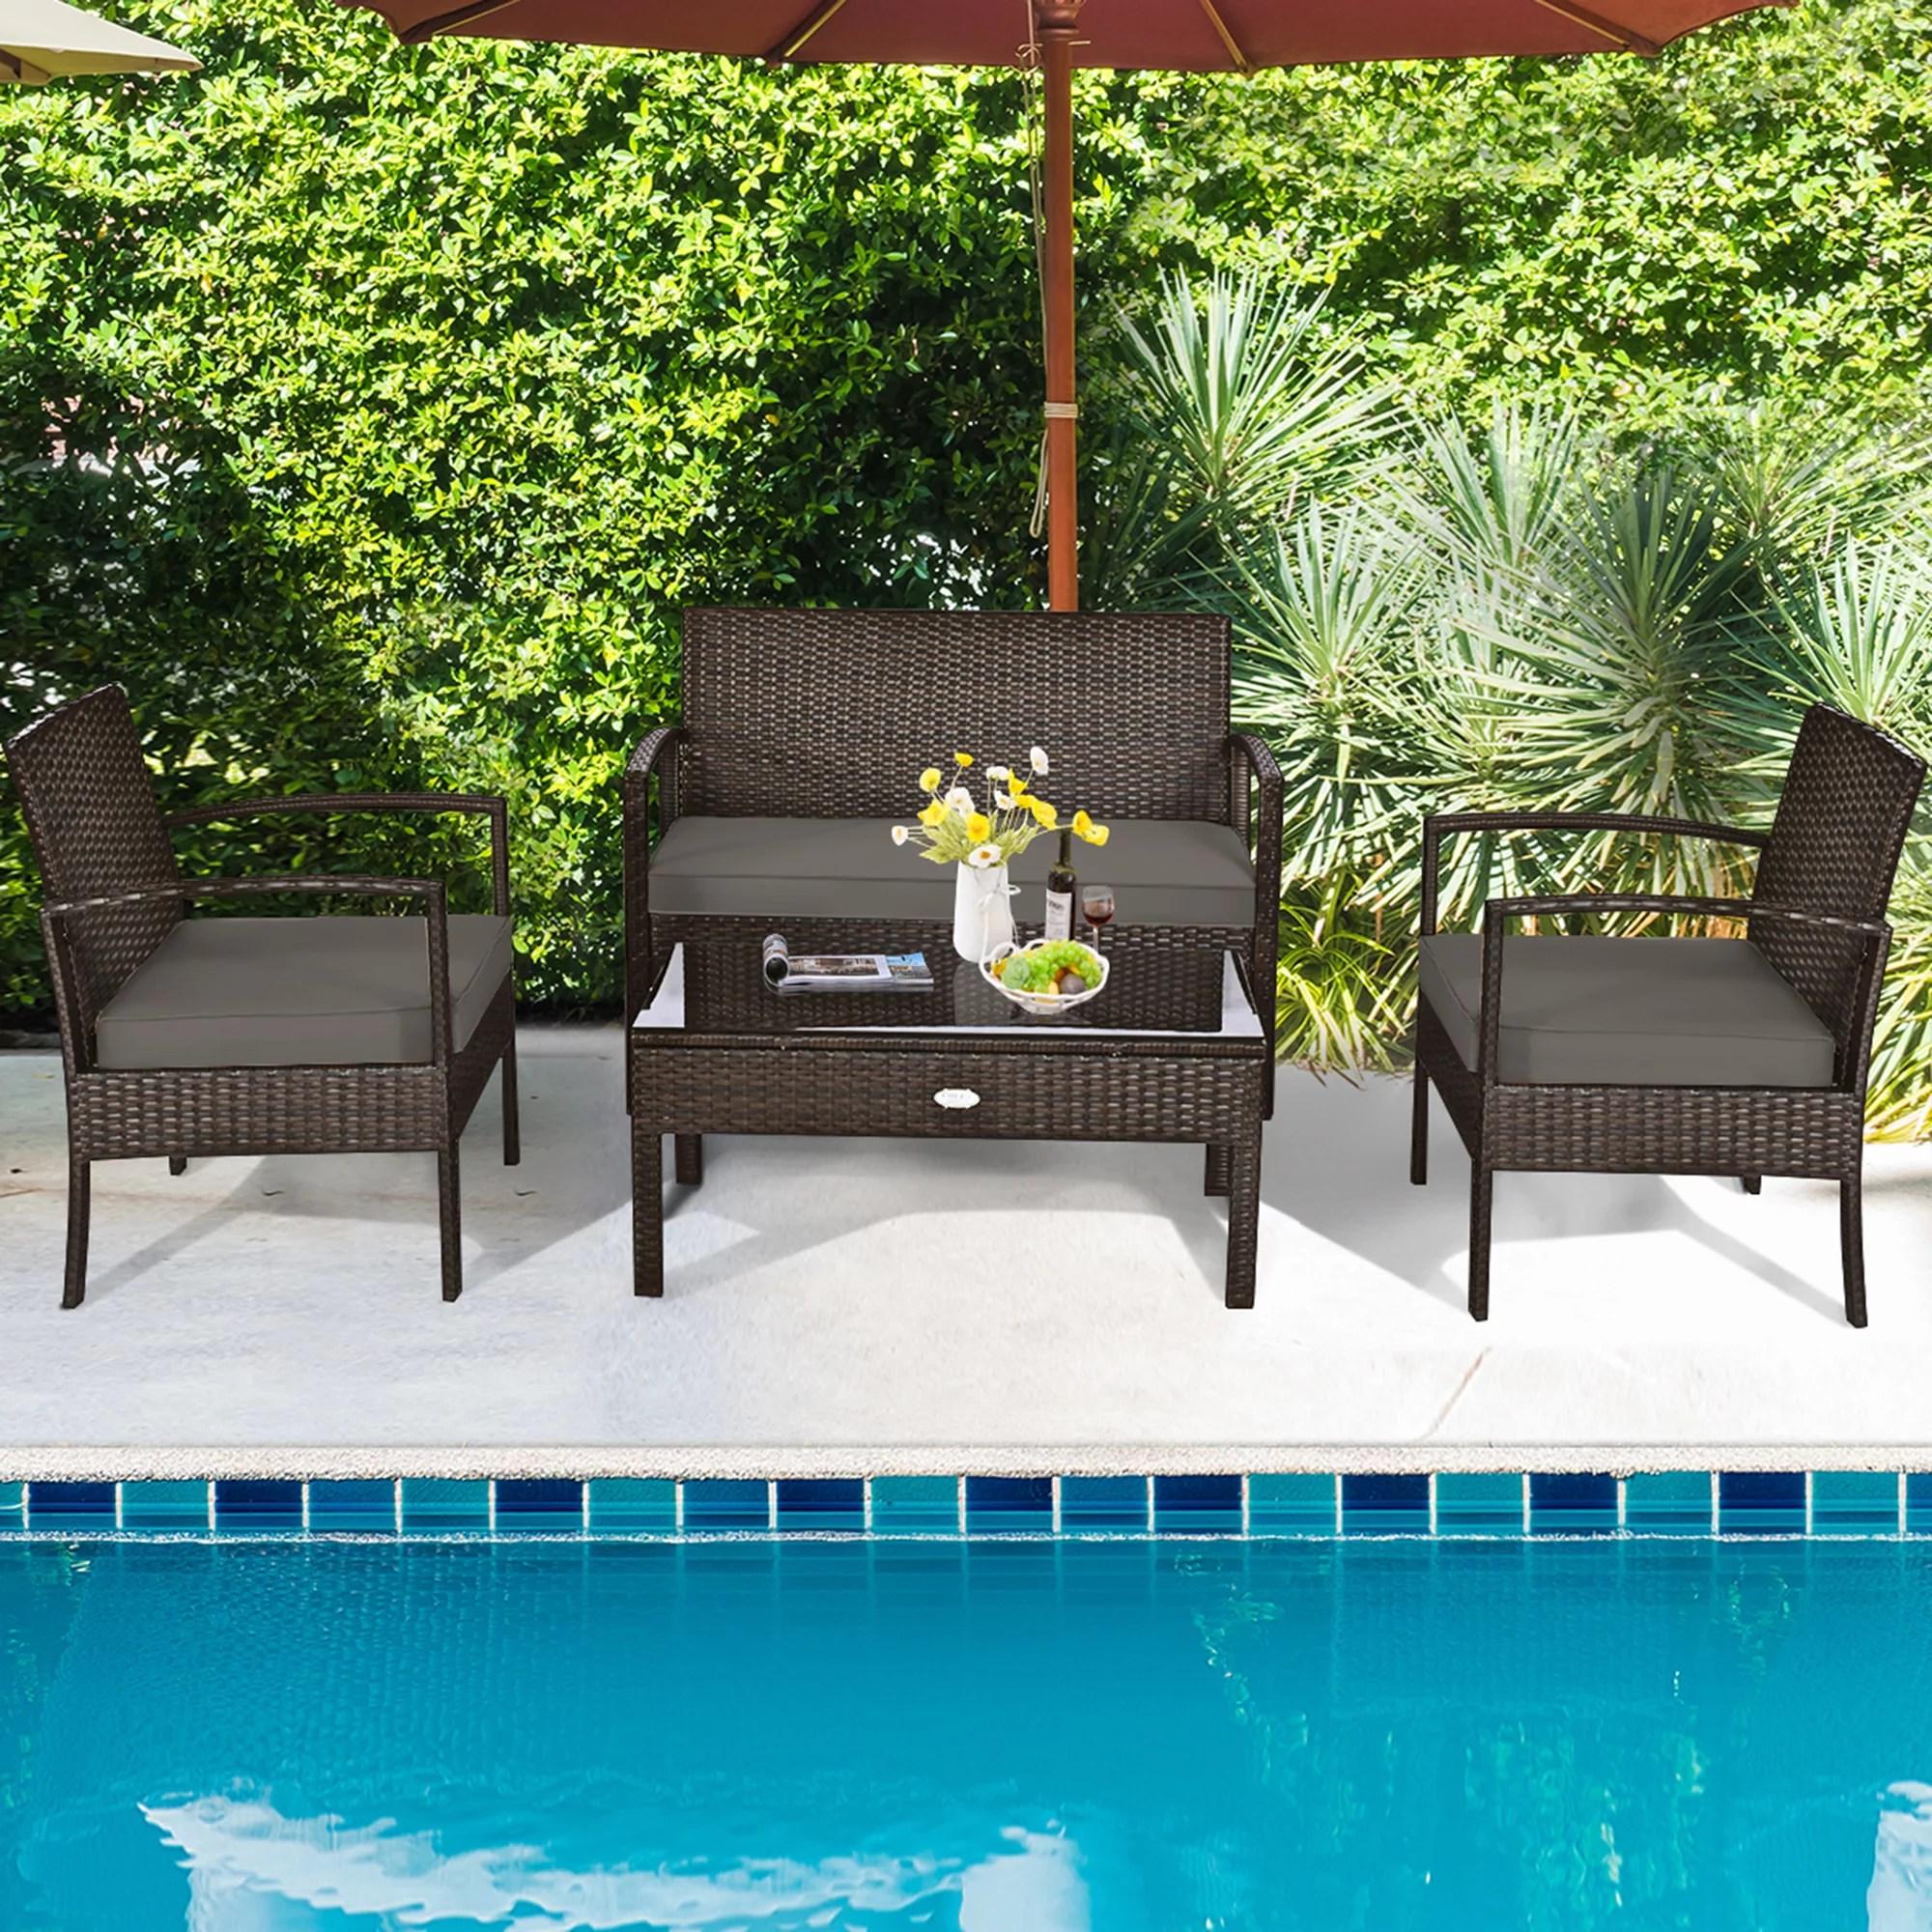 gymax patio garden outdoor 4pc rattan wicker furniture set